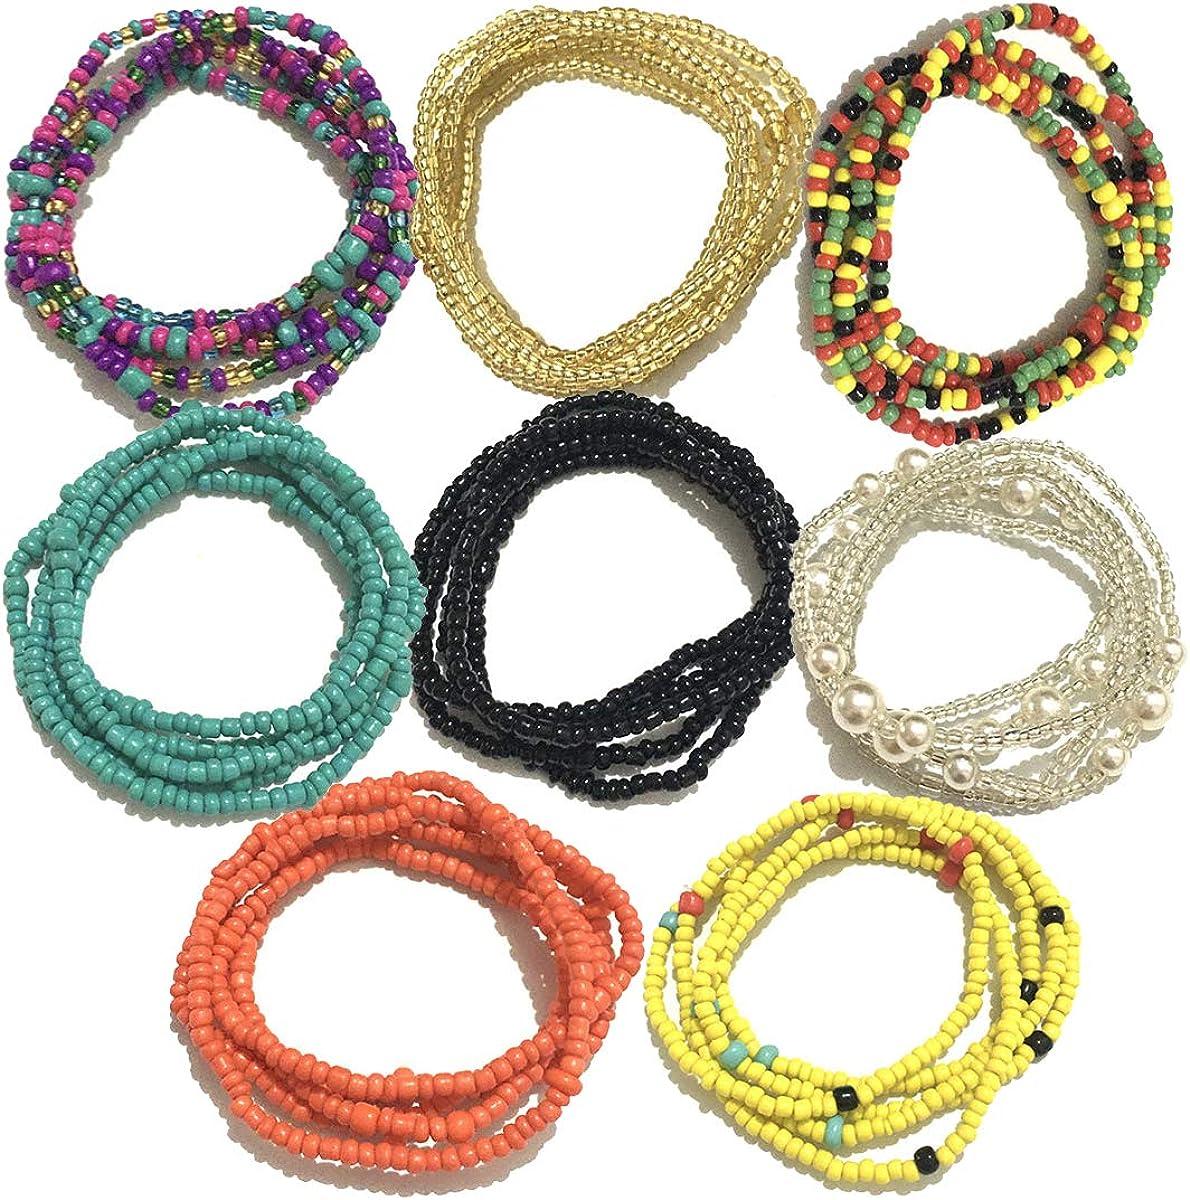 1x African waist beads Slim Figure Shaping Bikini// Belly Chain Fashion 27.5 Inch